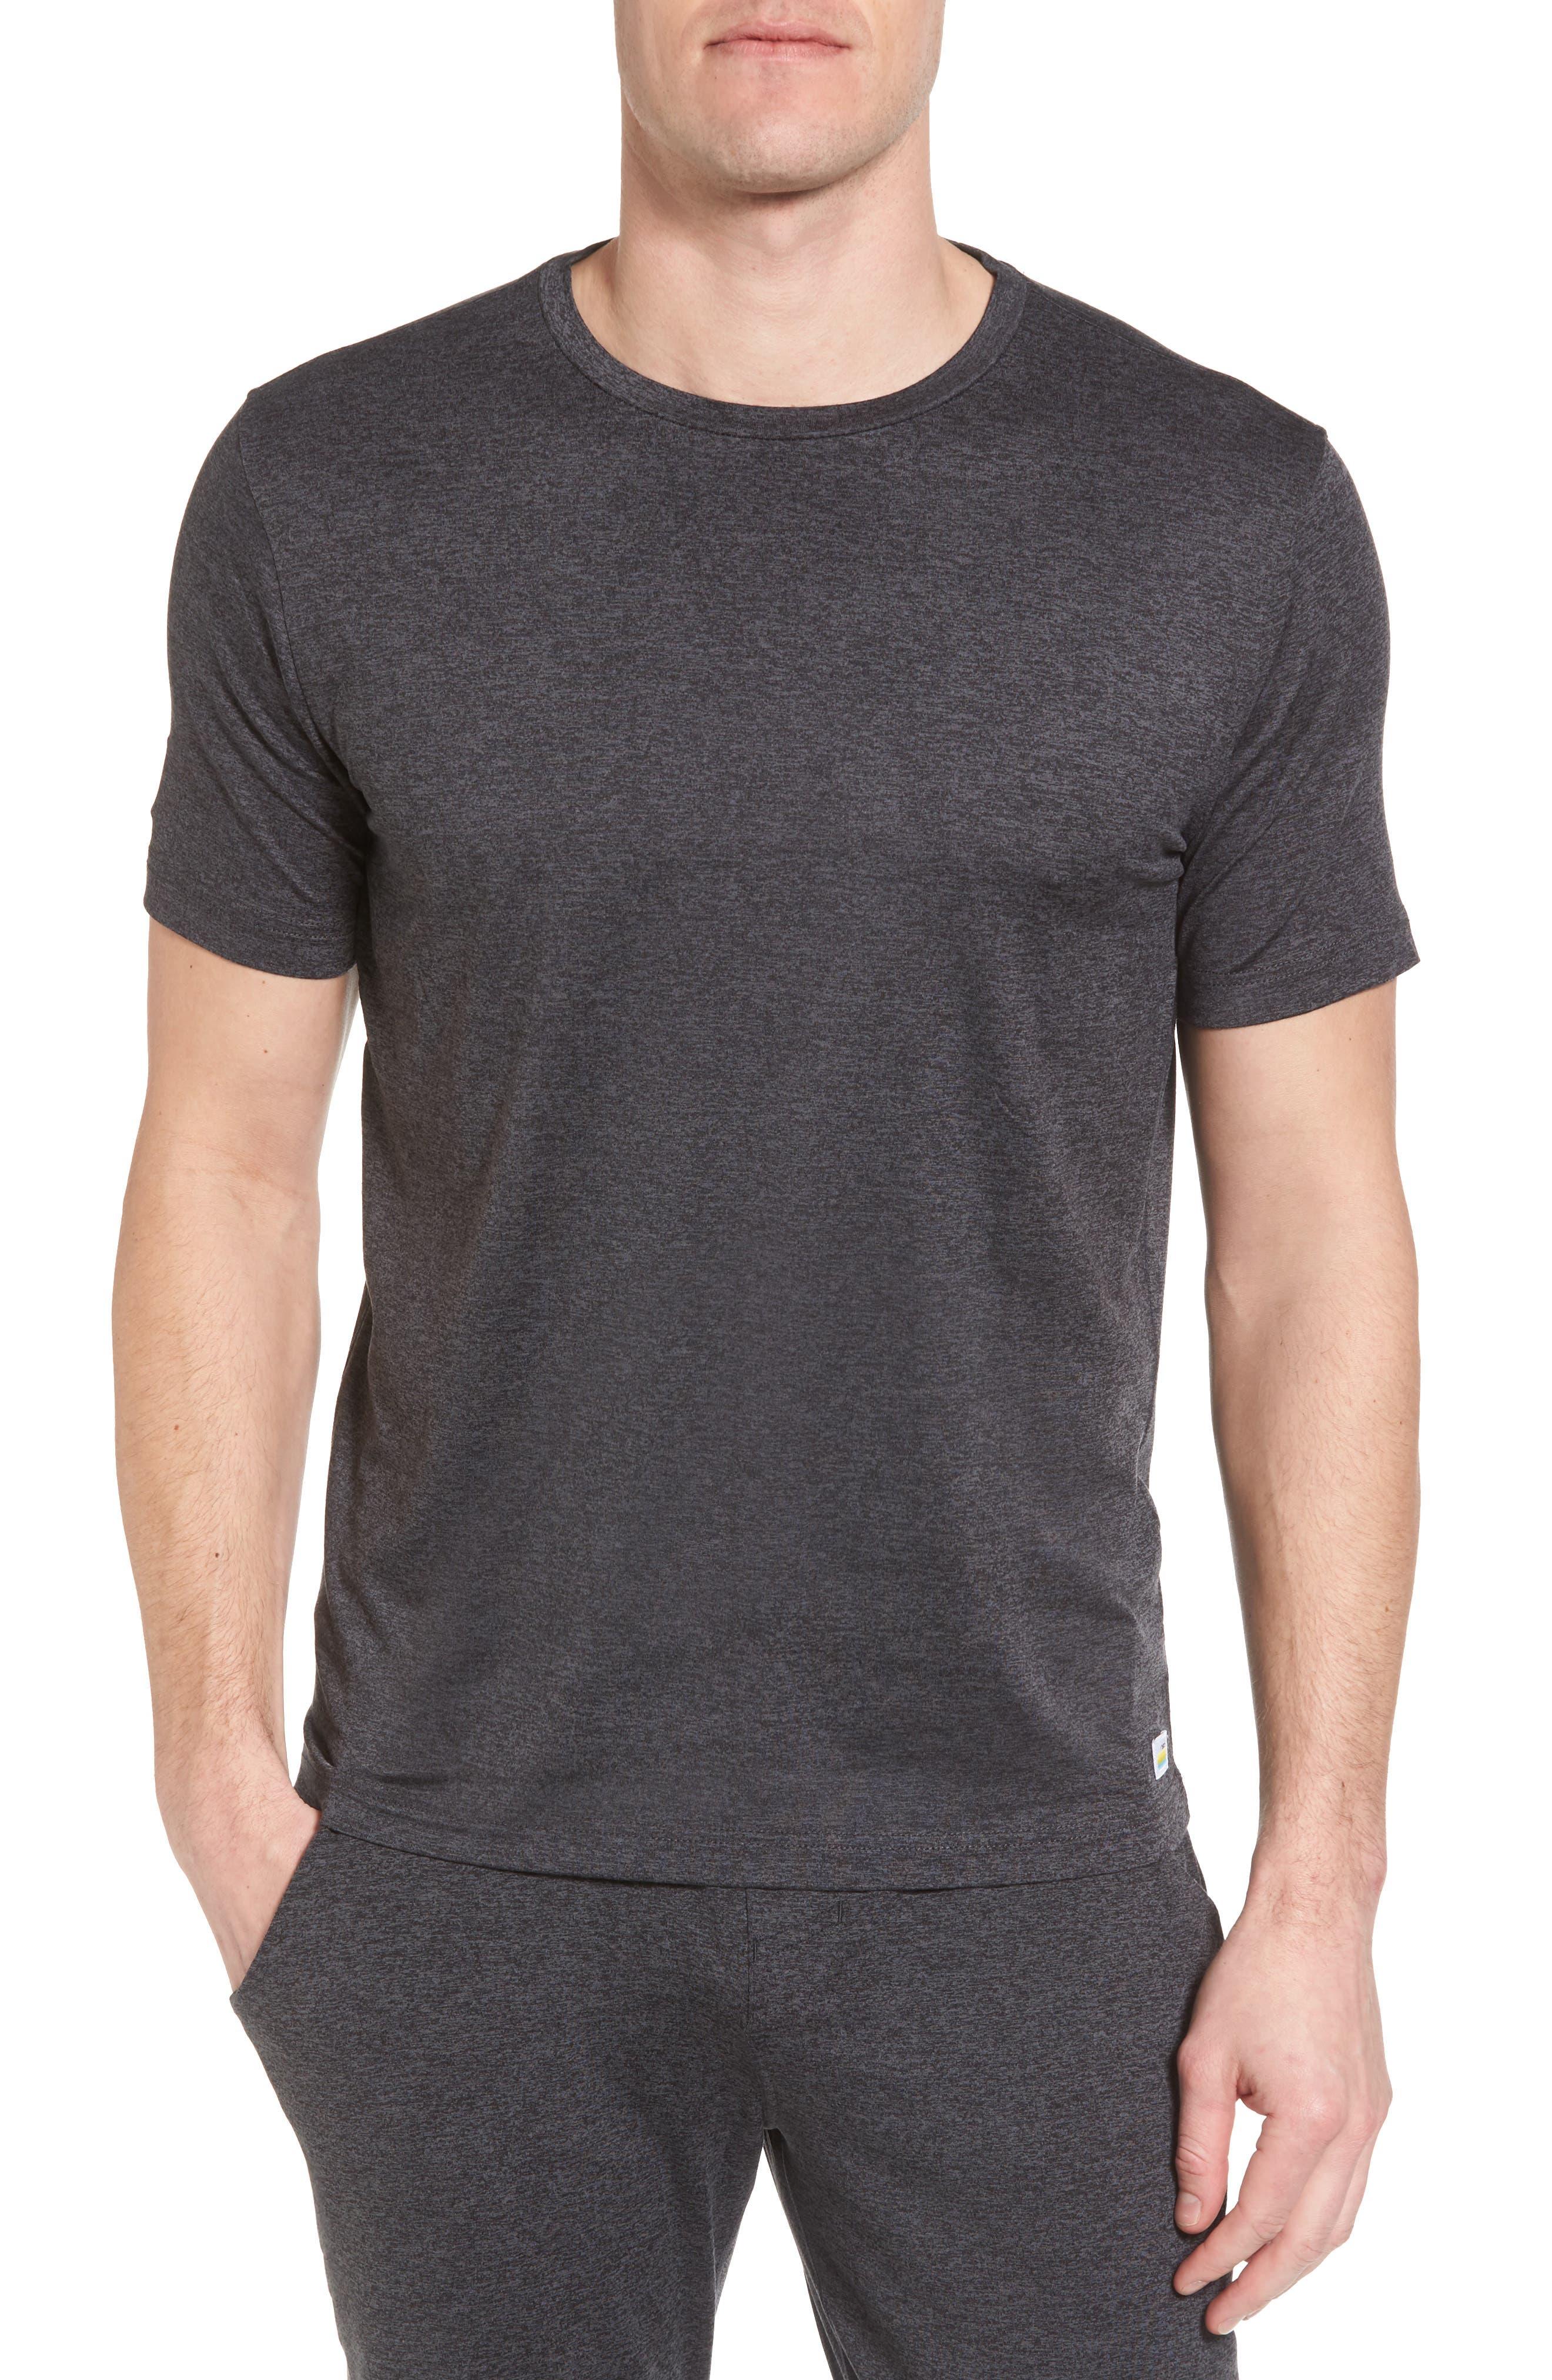 Vuori Strato Slim Fit Crewneck T-Shirt